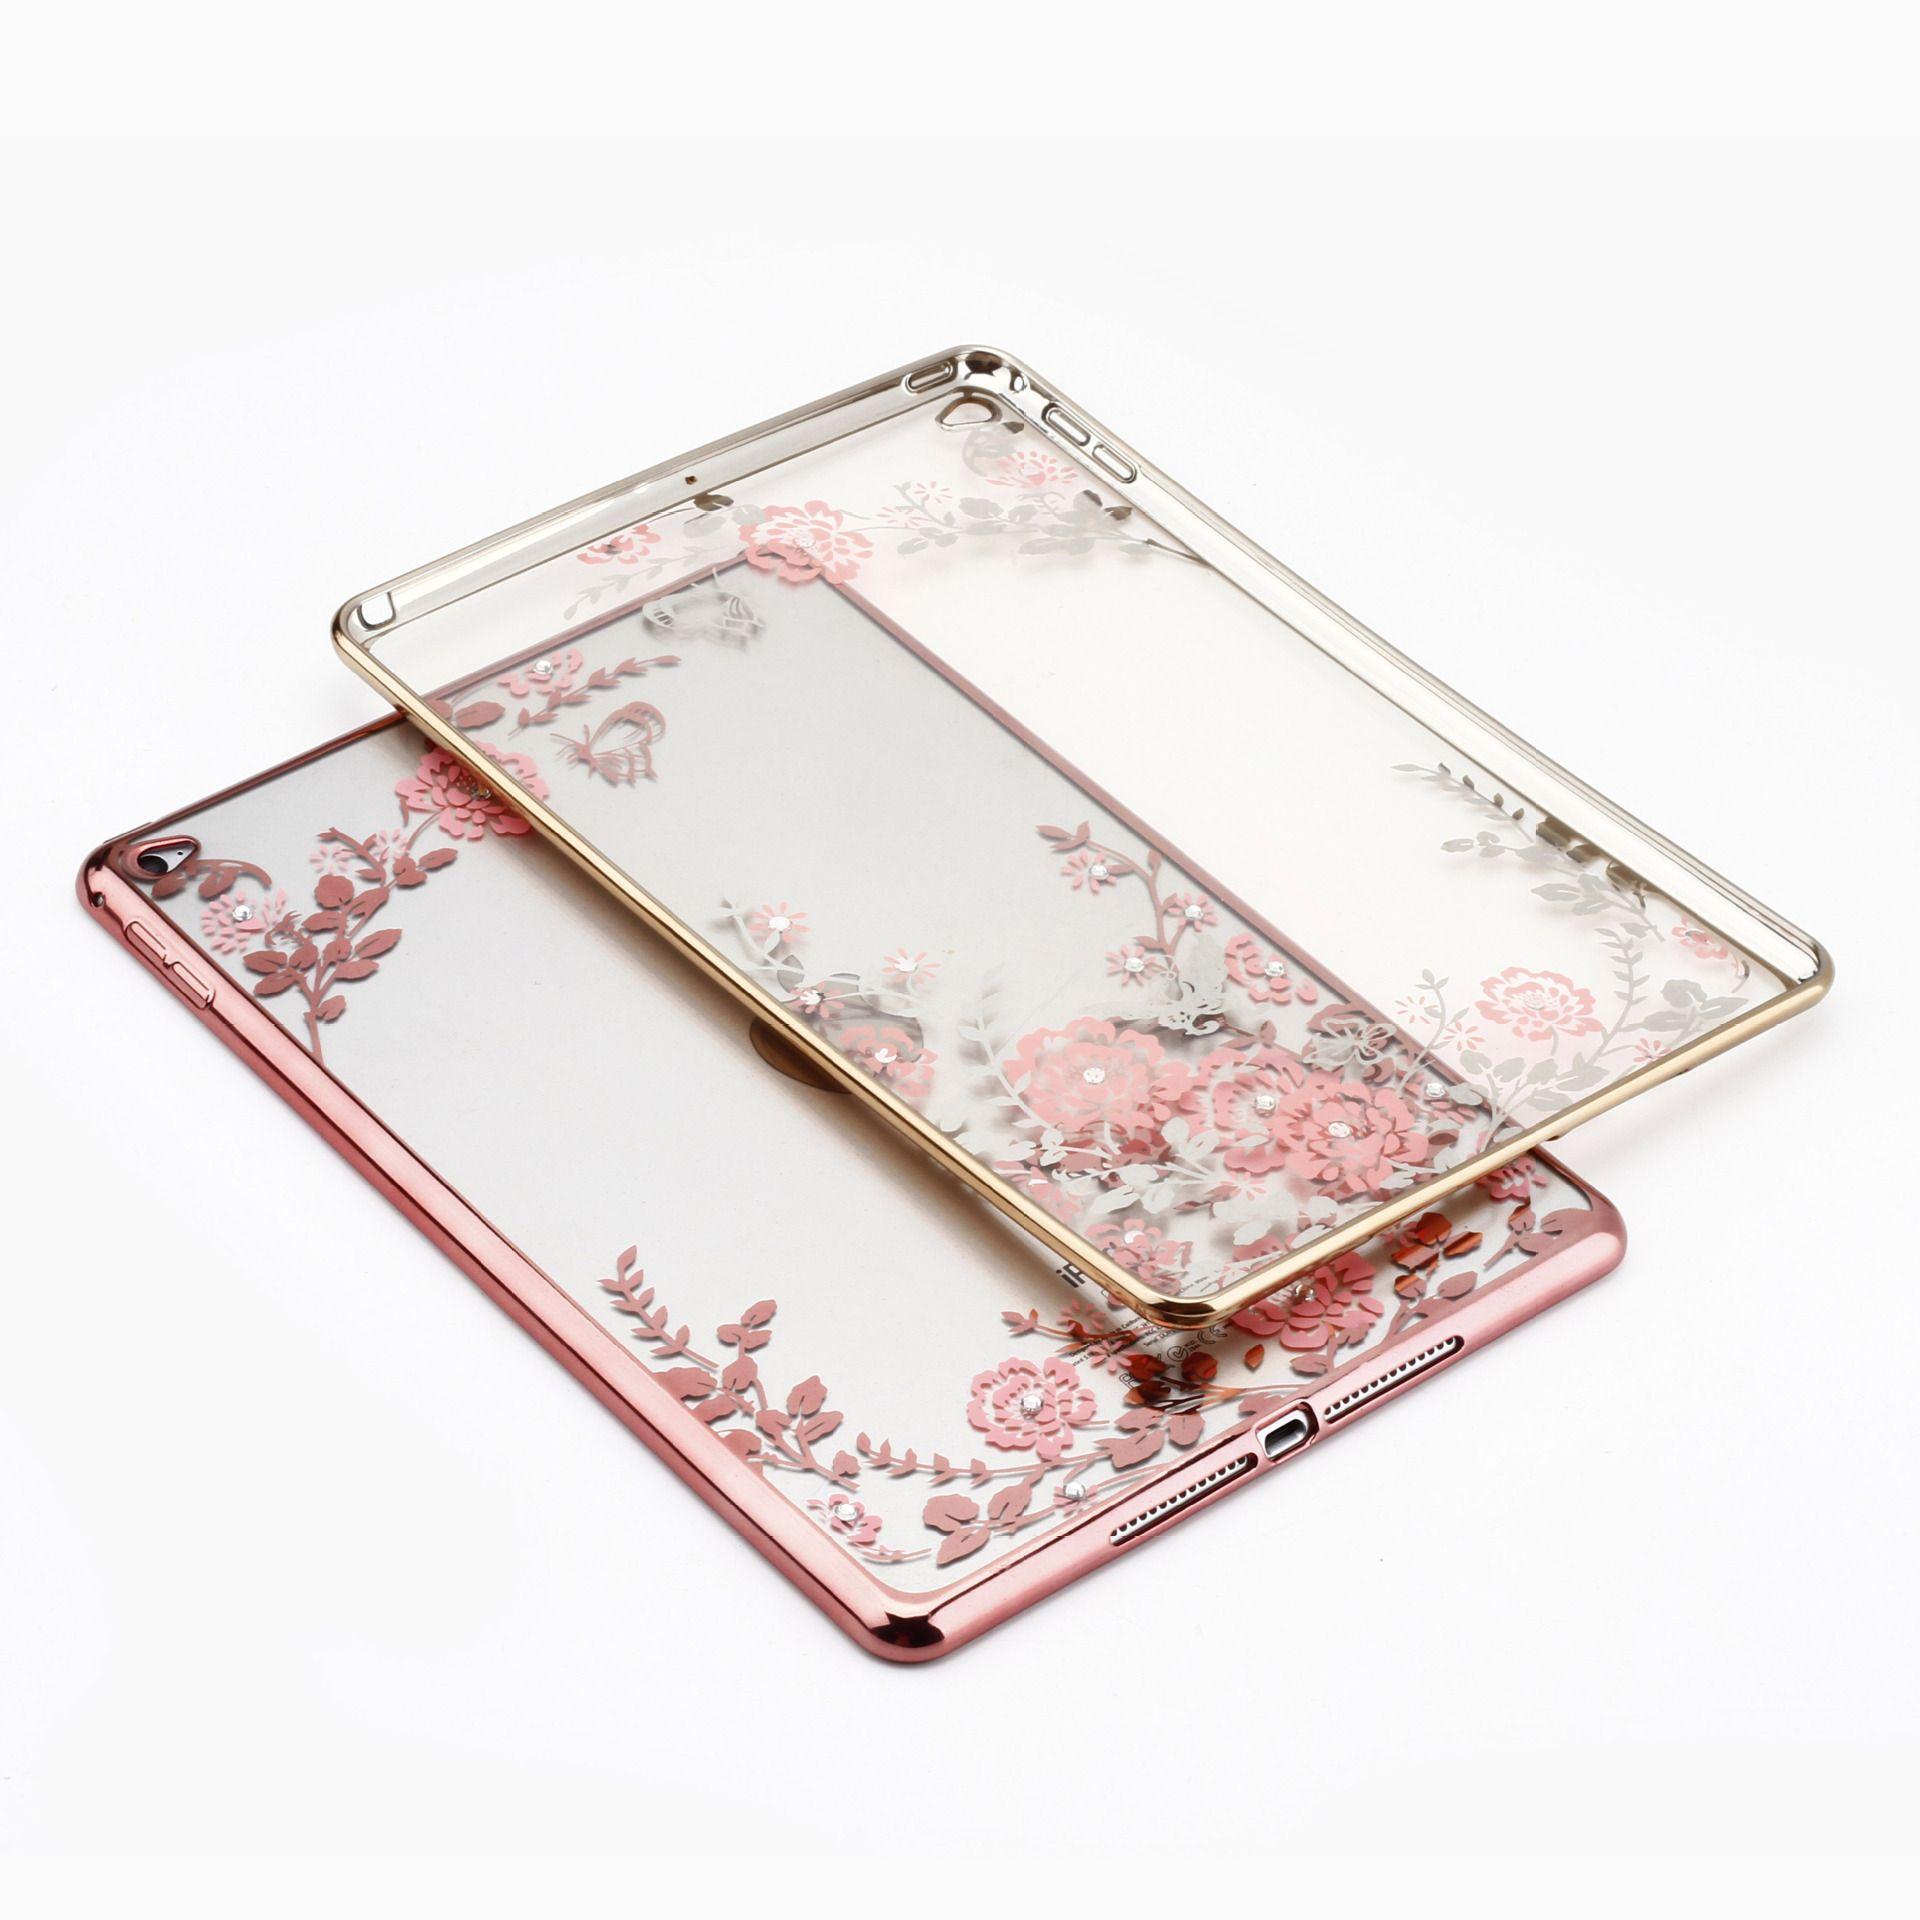 Diamond Secret Garden Flower iPad Mini 2 3 4 iPad air1 air2 Pro Cornice elettroplaccatura Transparen Soft TPU Tablet Custodia